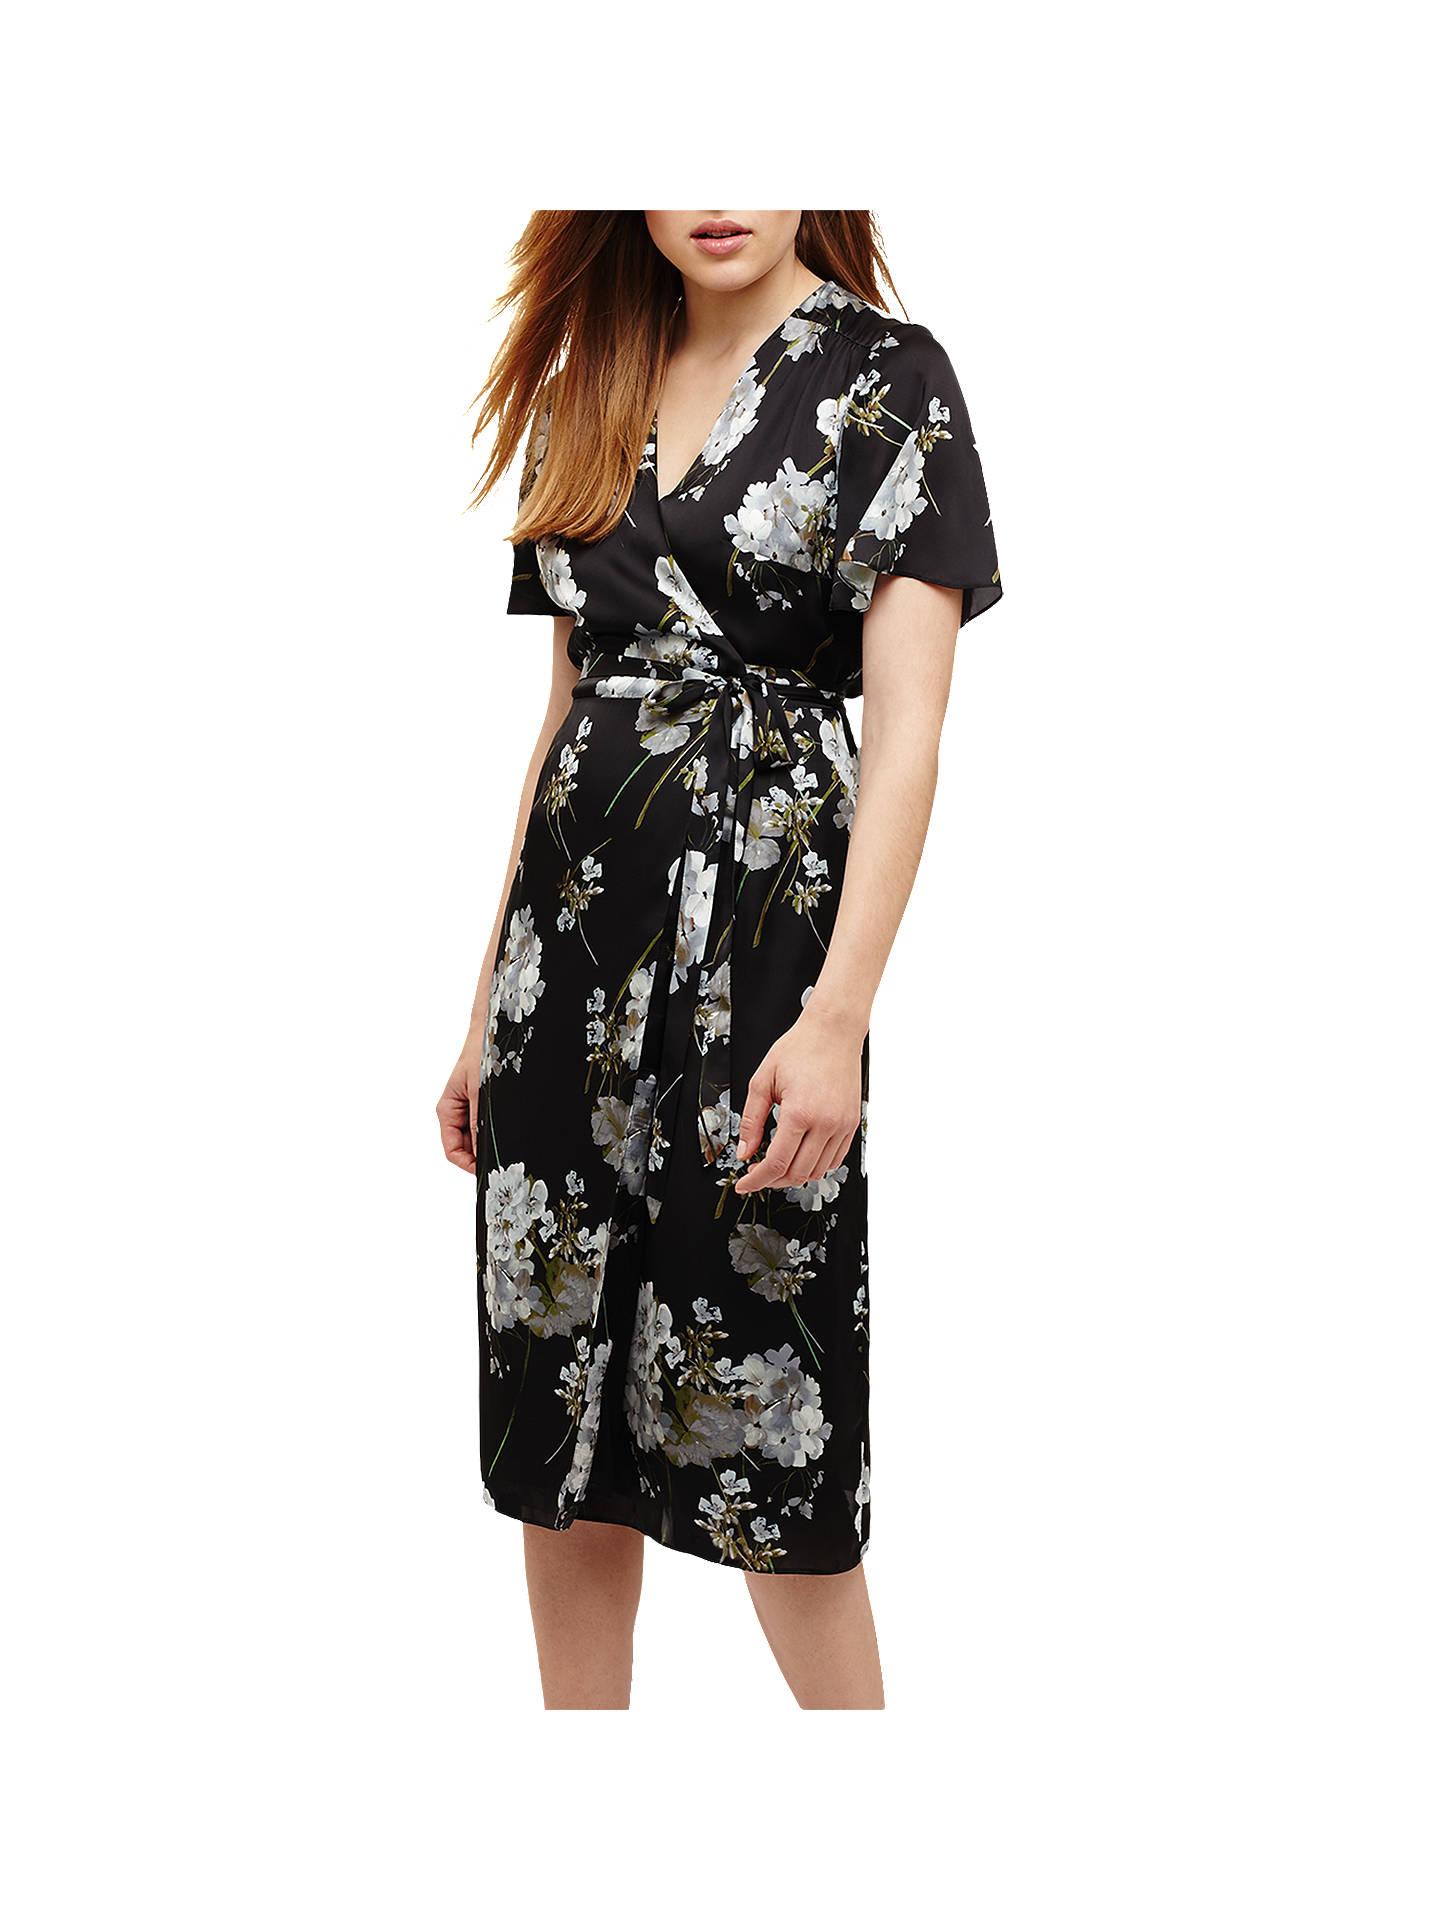 871f77a48b77 Buy Phase Eight Tasha Floral Print Wrap Dress